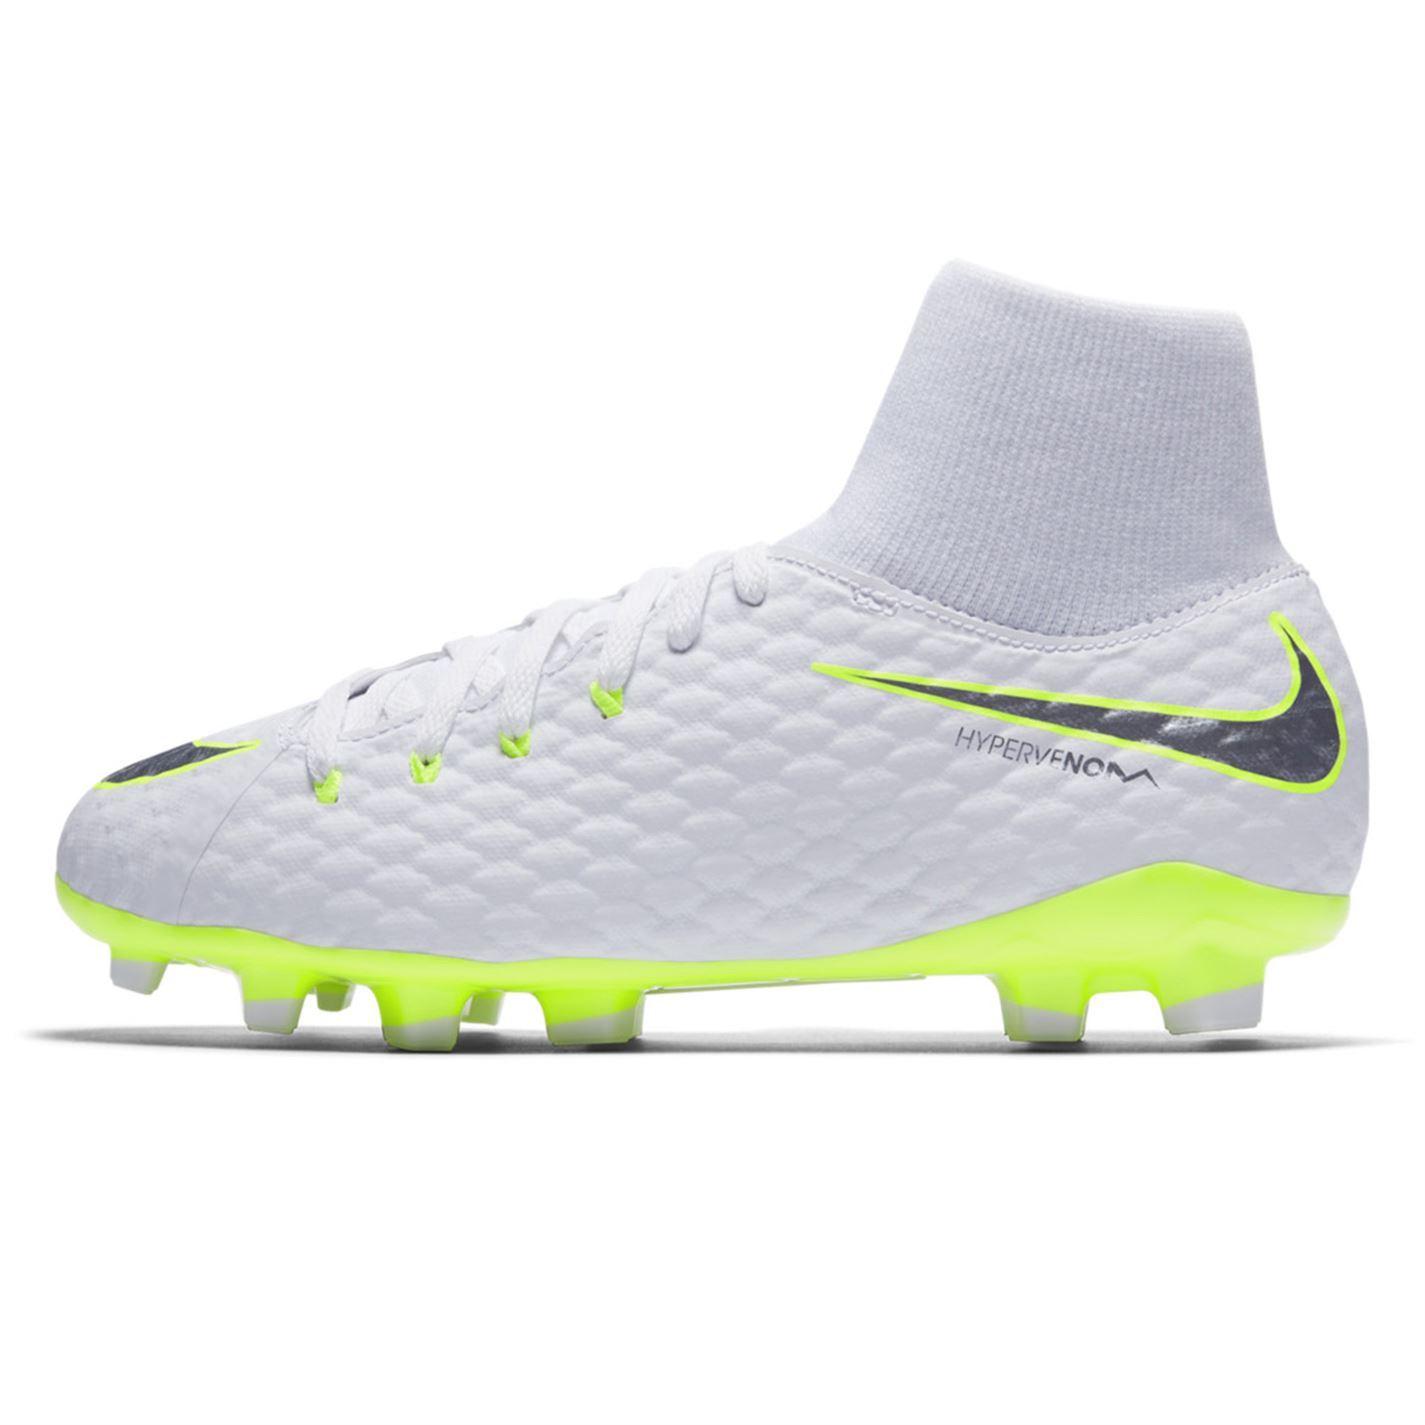 Details about Nike Hypervenom Phantom Academy Firm Ground Football Boots Juniors Soccer Cleats